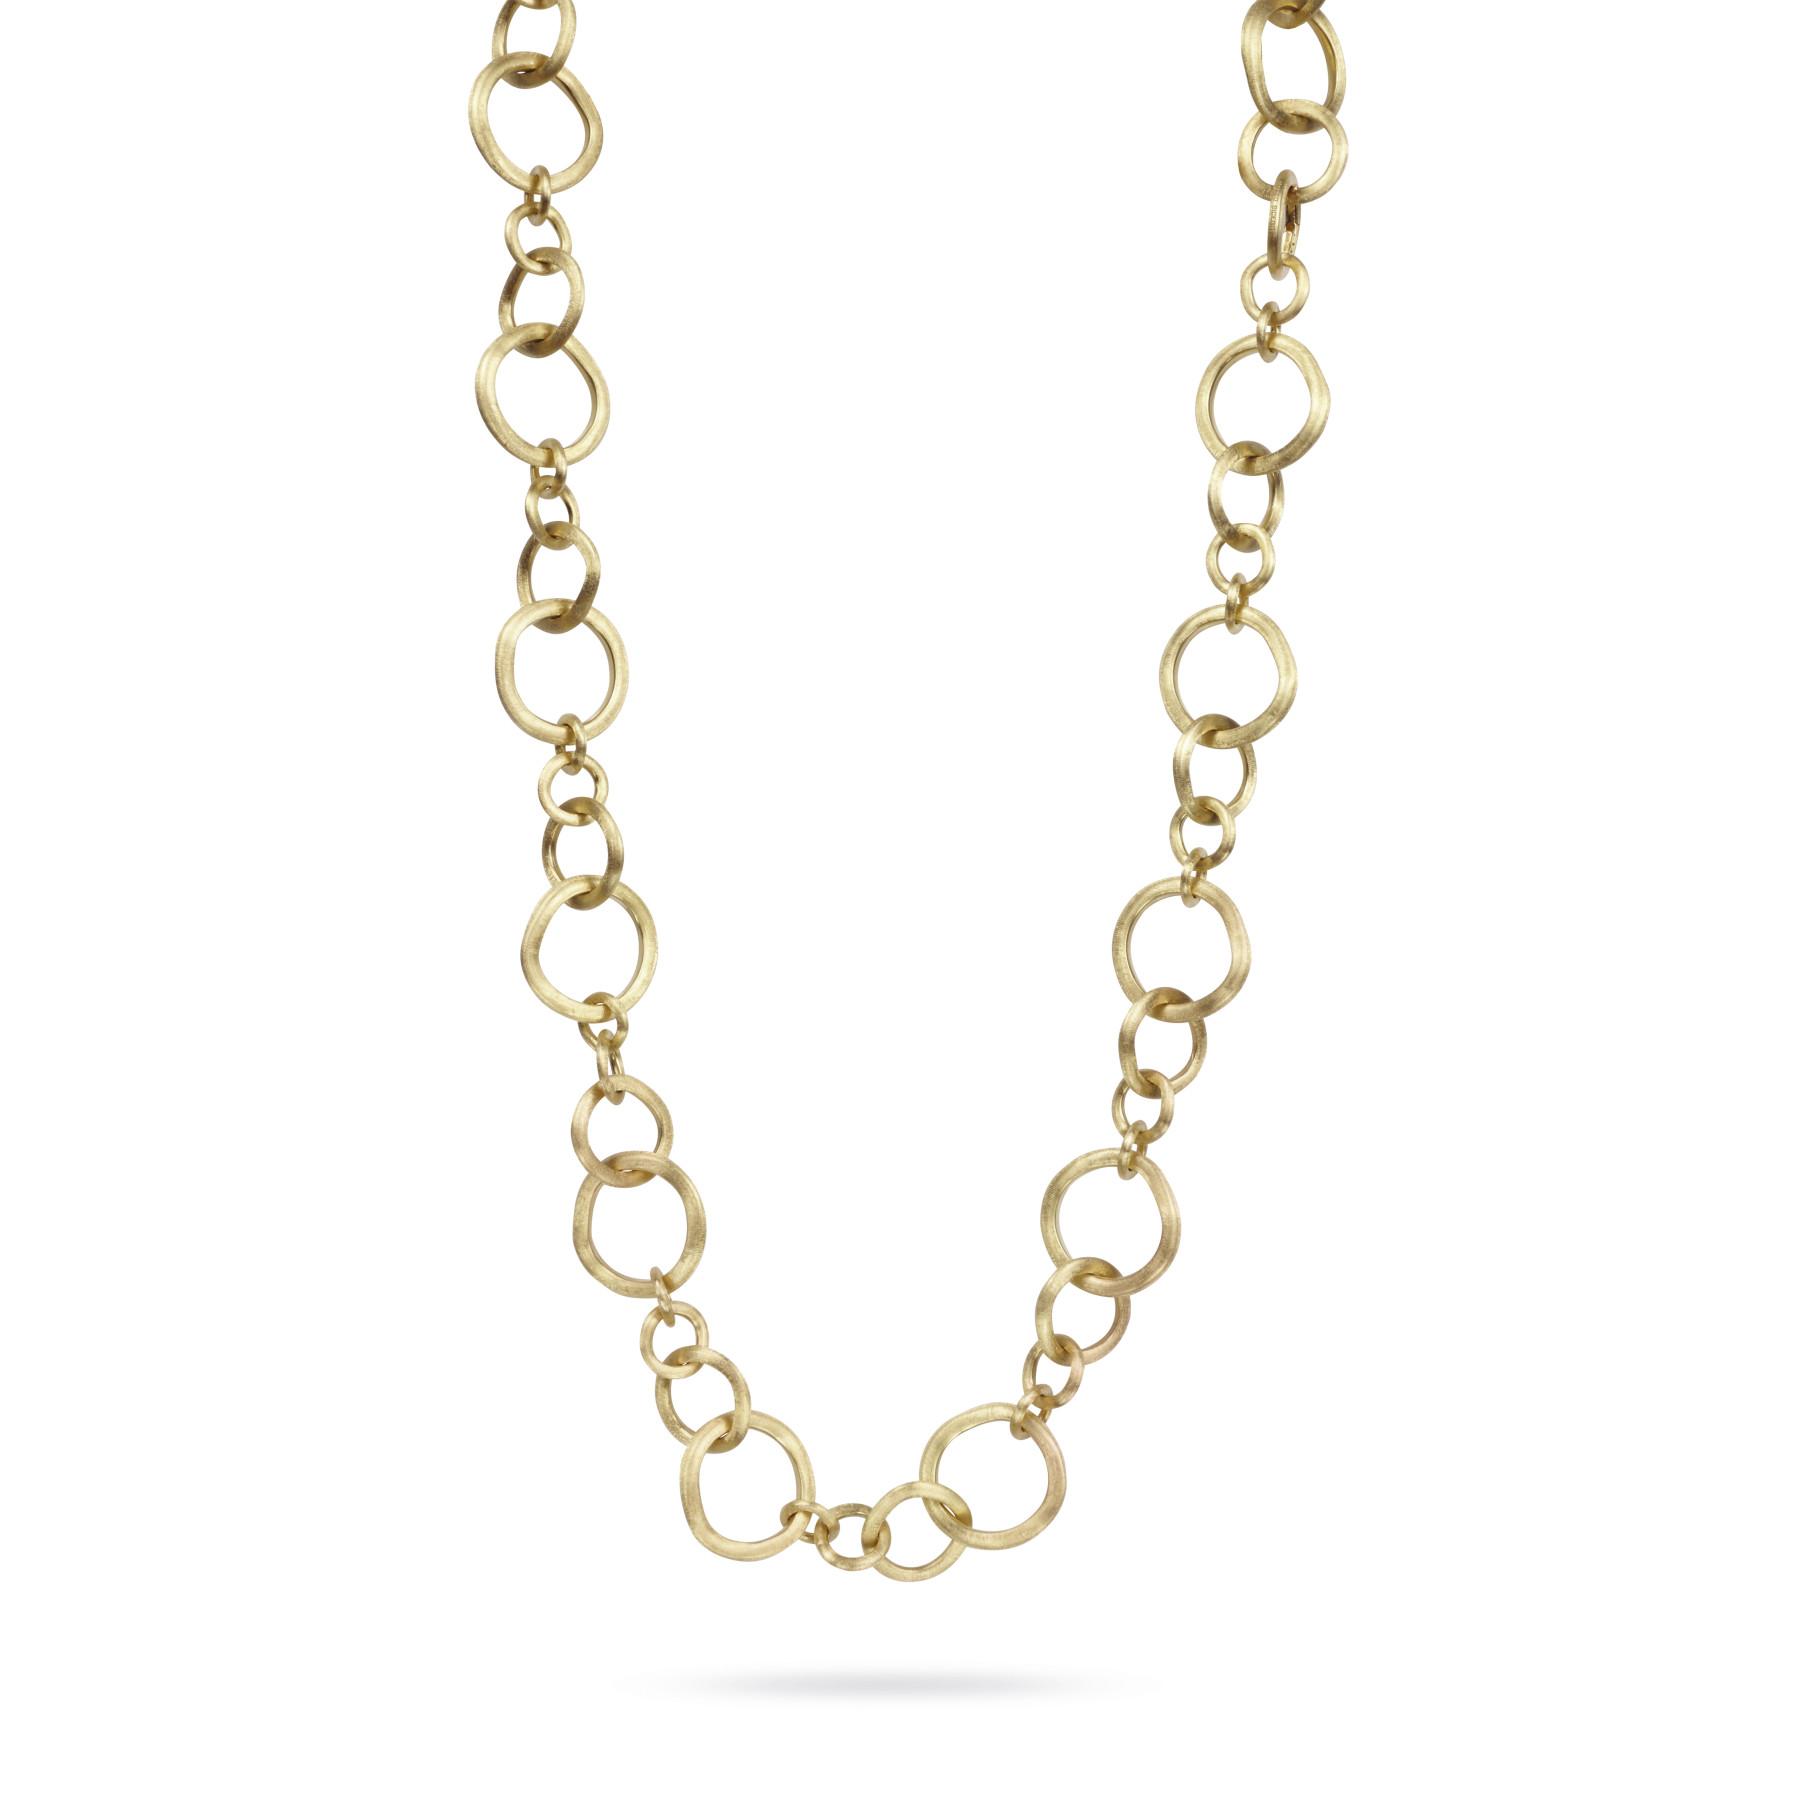 Marco Bicego Jaipur Link Medium Link Convertible Necklace